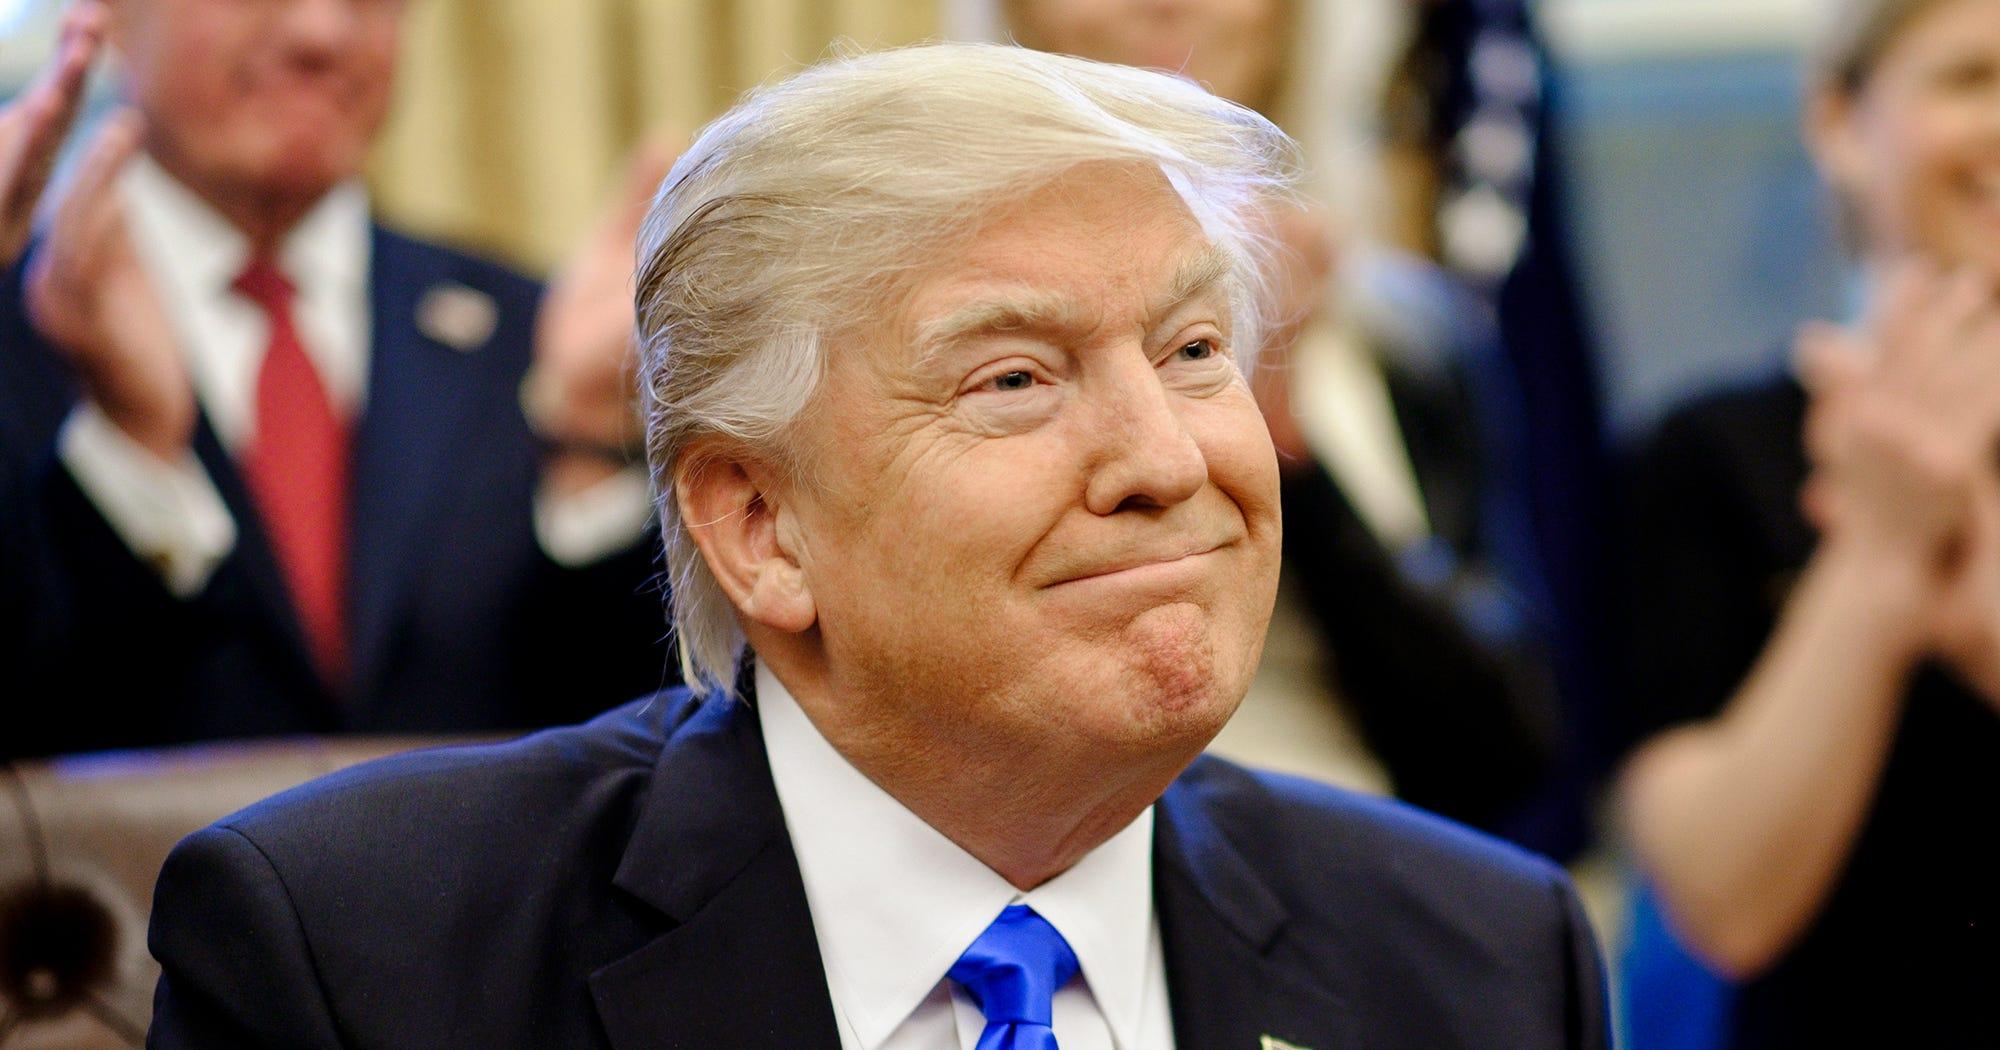 Donald Trump Mental Health Diagnosis Narcissism Twitter